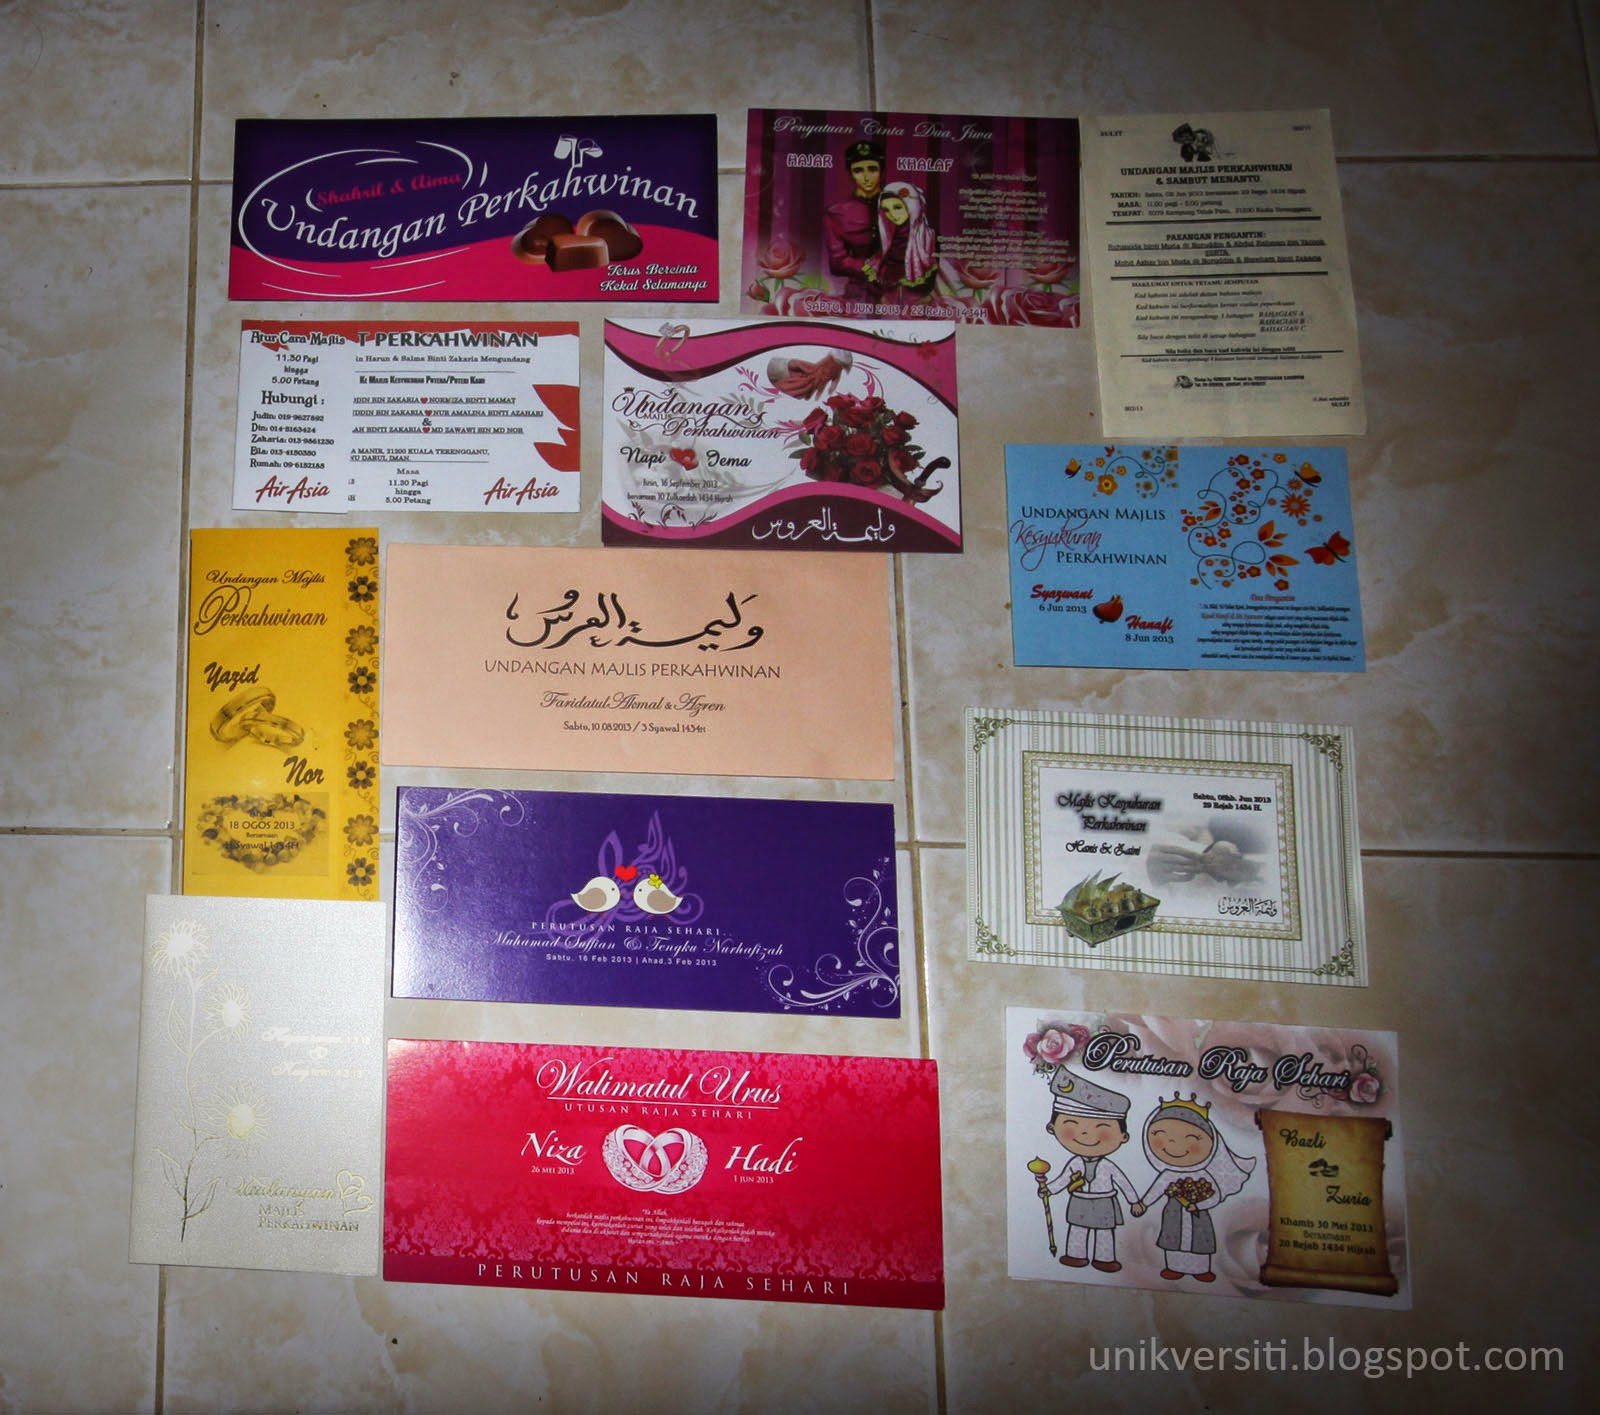 Kad Jemputan Kahwin tahun 2011 - 2013